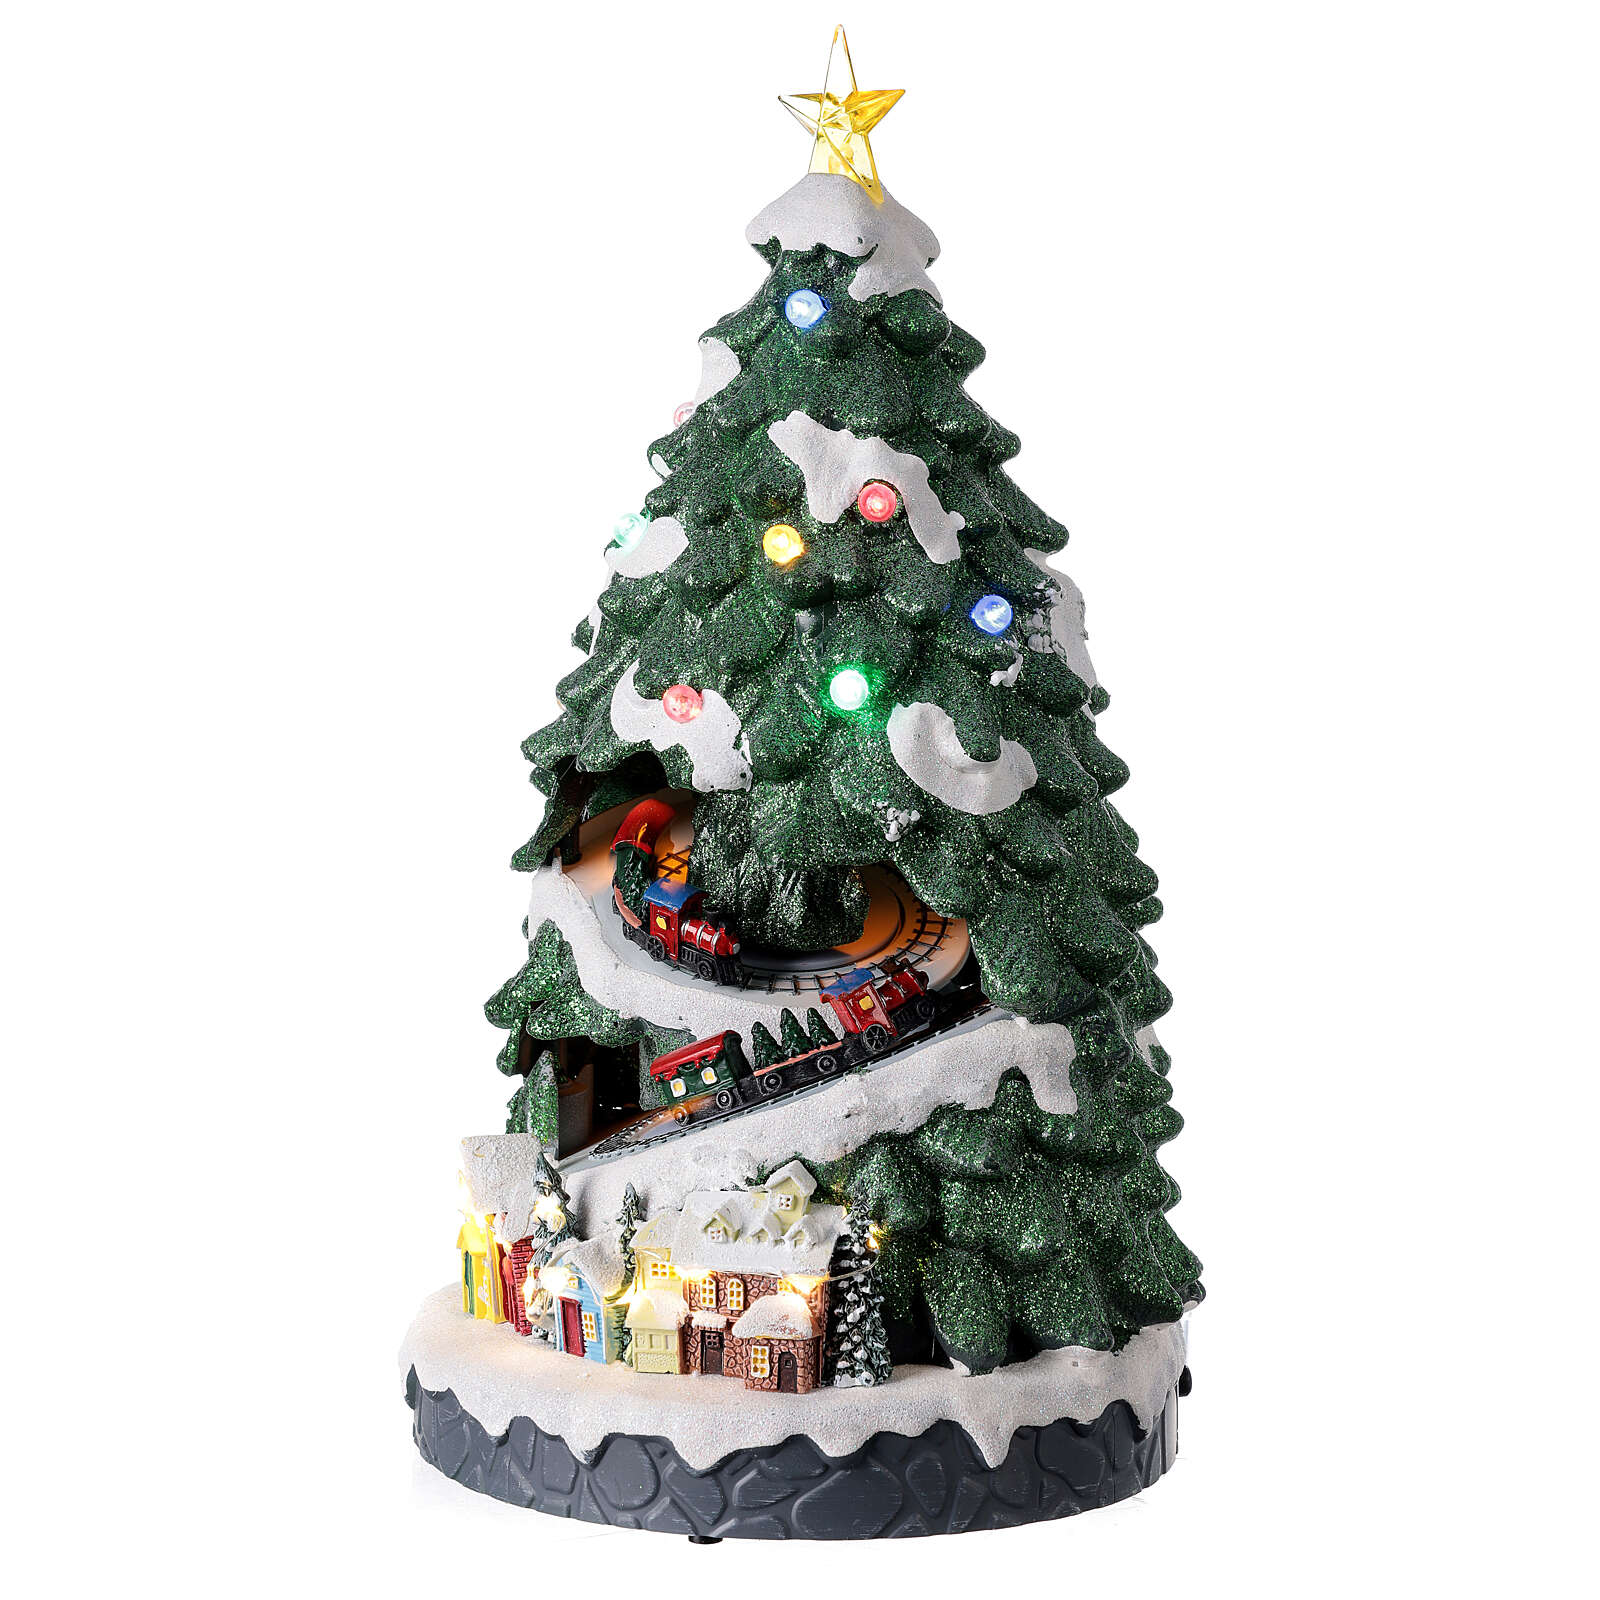 Tree Christmas village train Santa sleigh lights music 45x25x25 cm 3